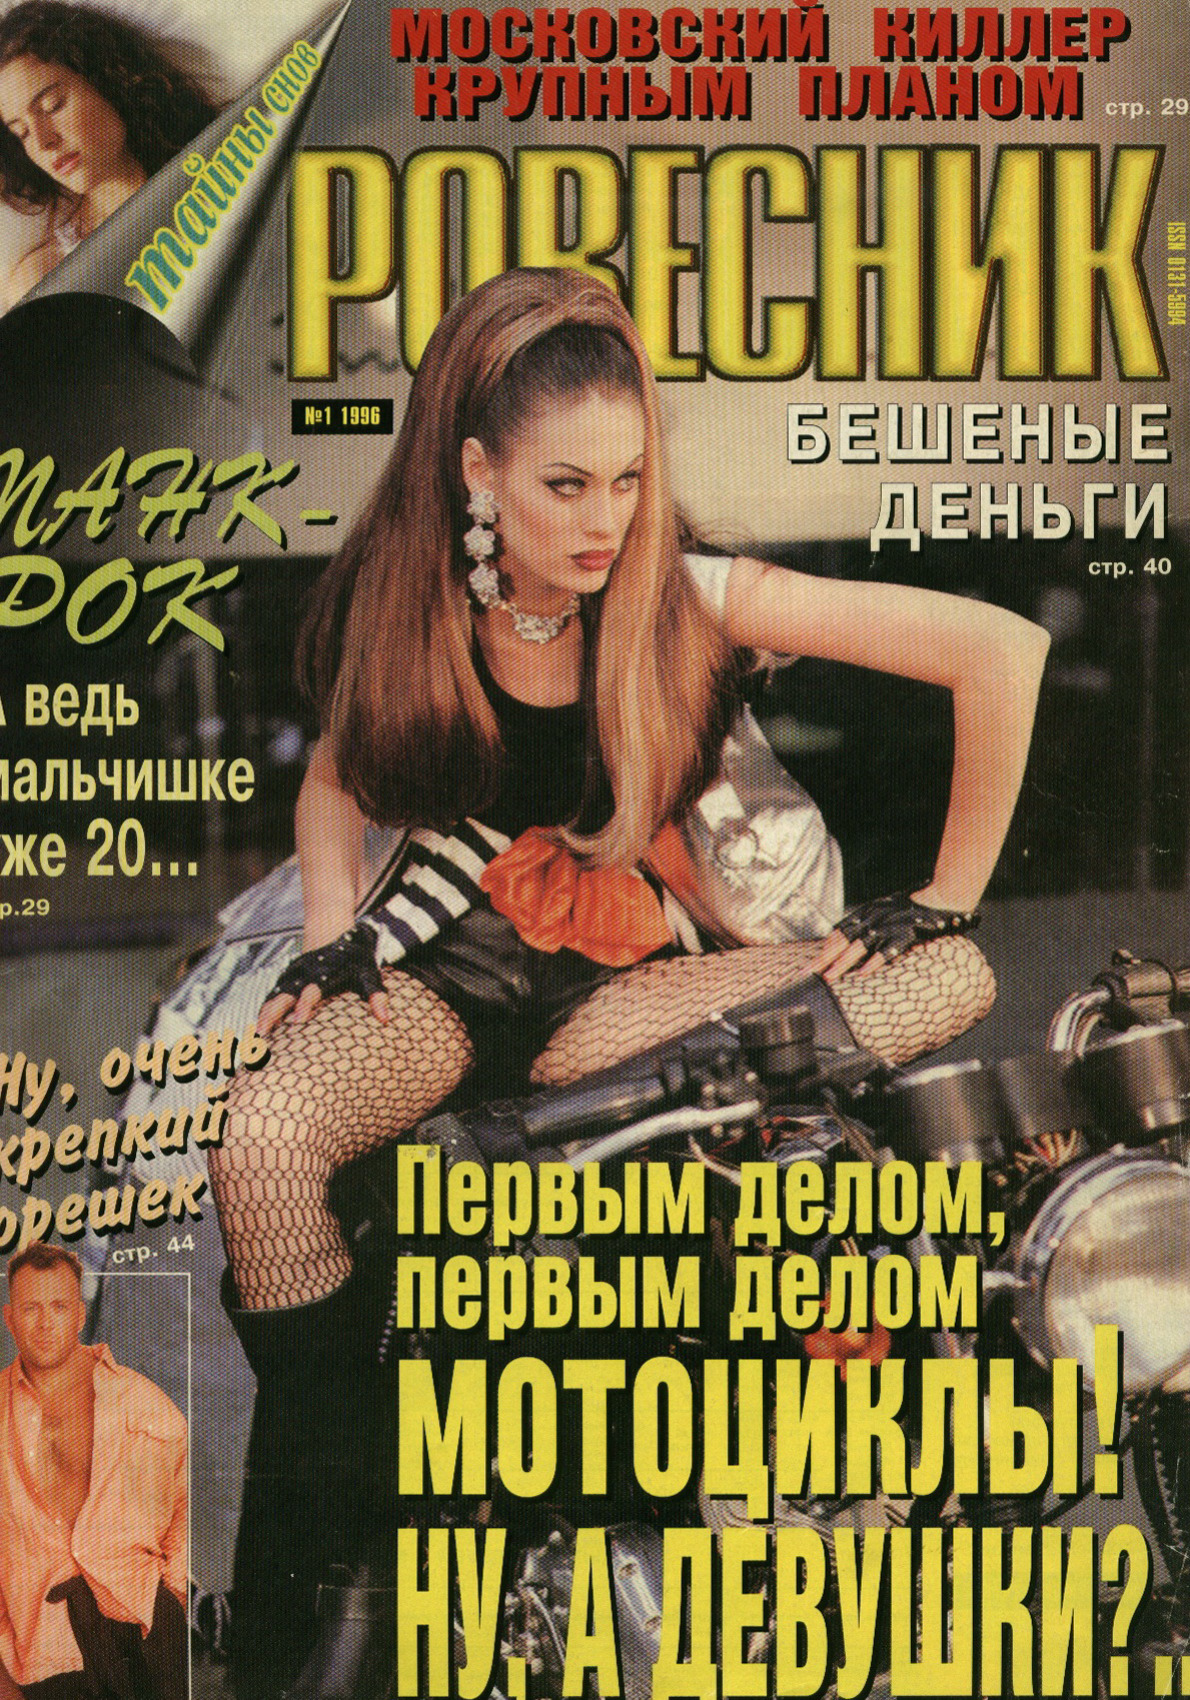 rovesnik-1996_01_1.jpg